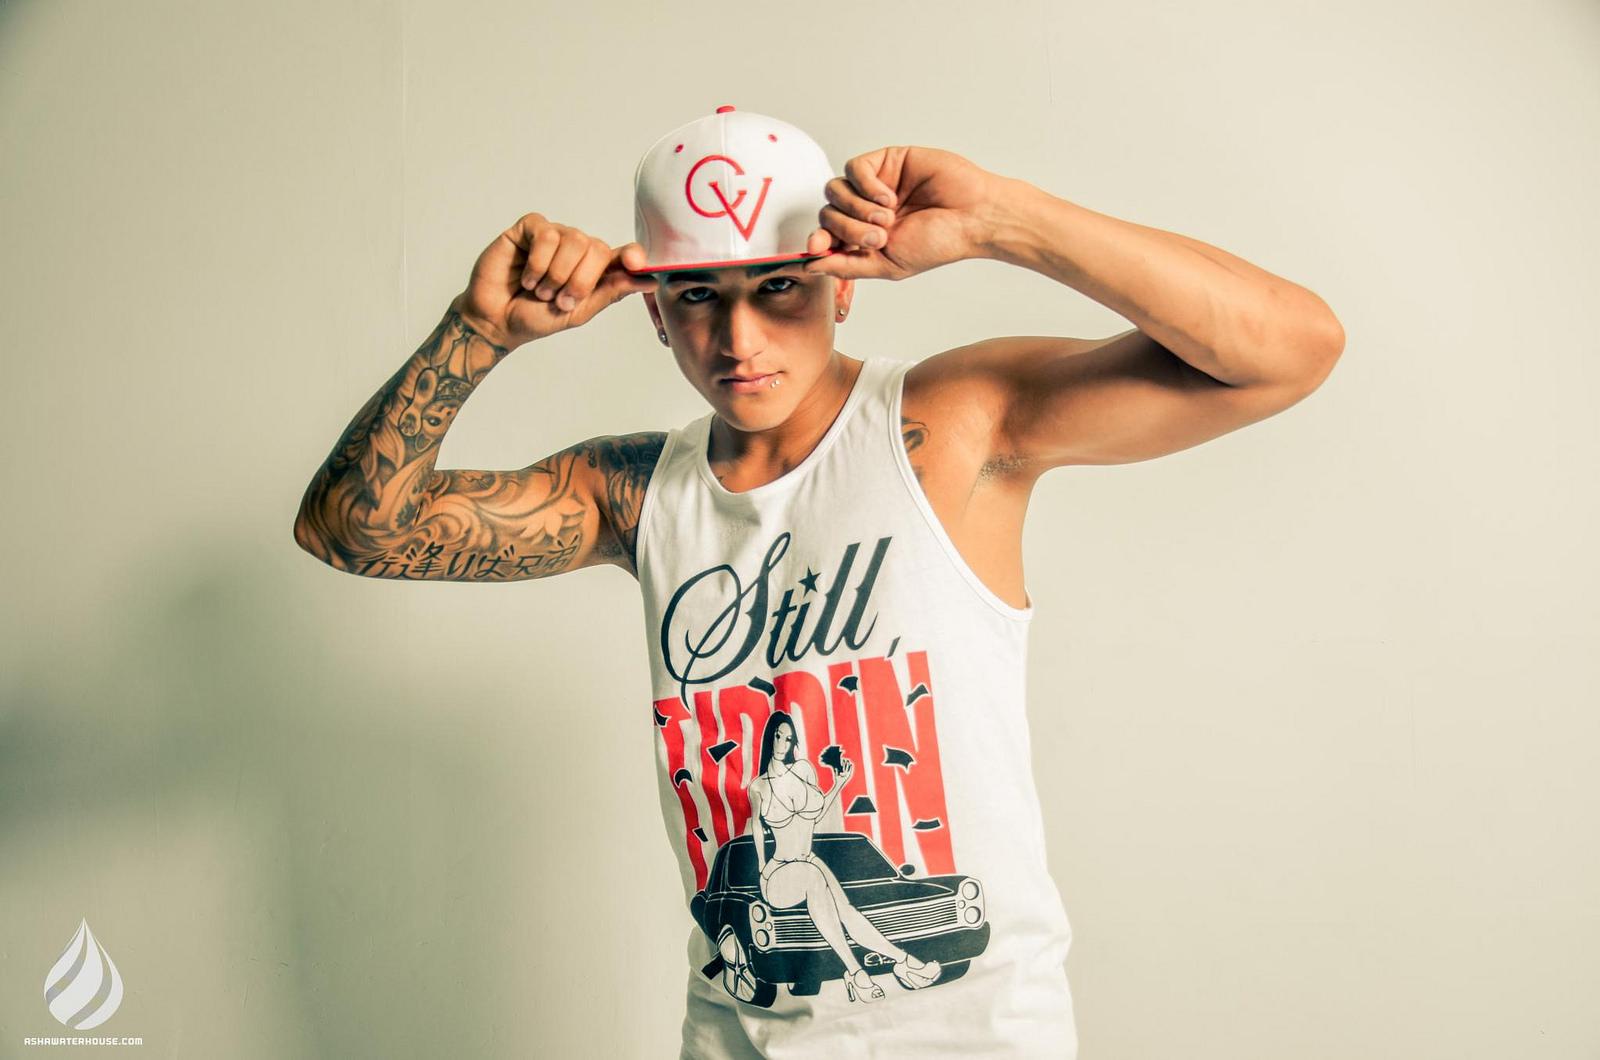 cv hat  u00b7 capital vice apparel  u00b7 online store powered by